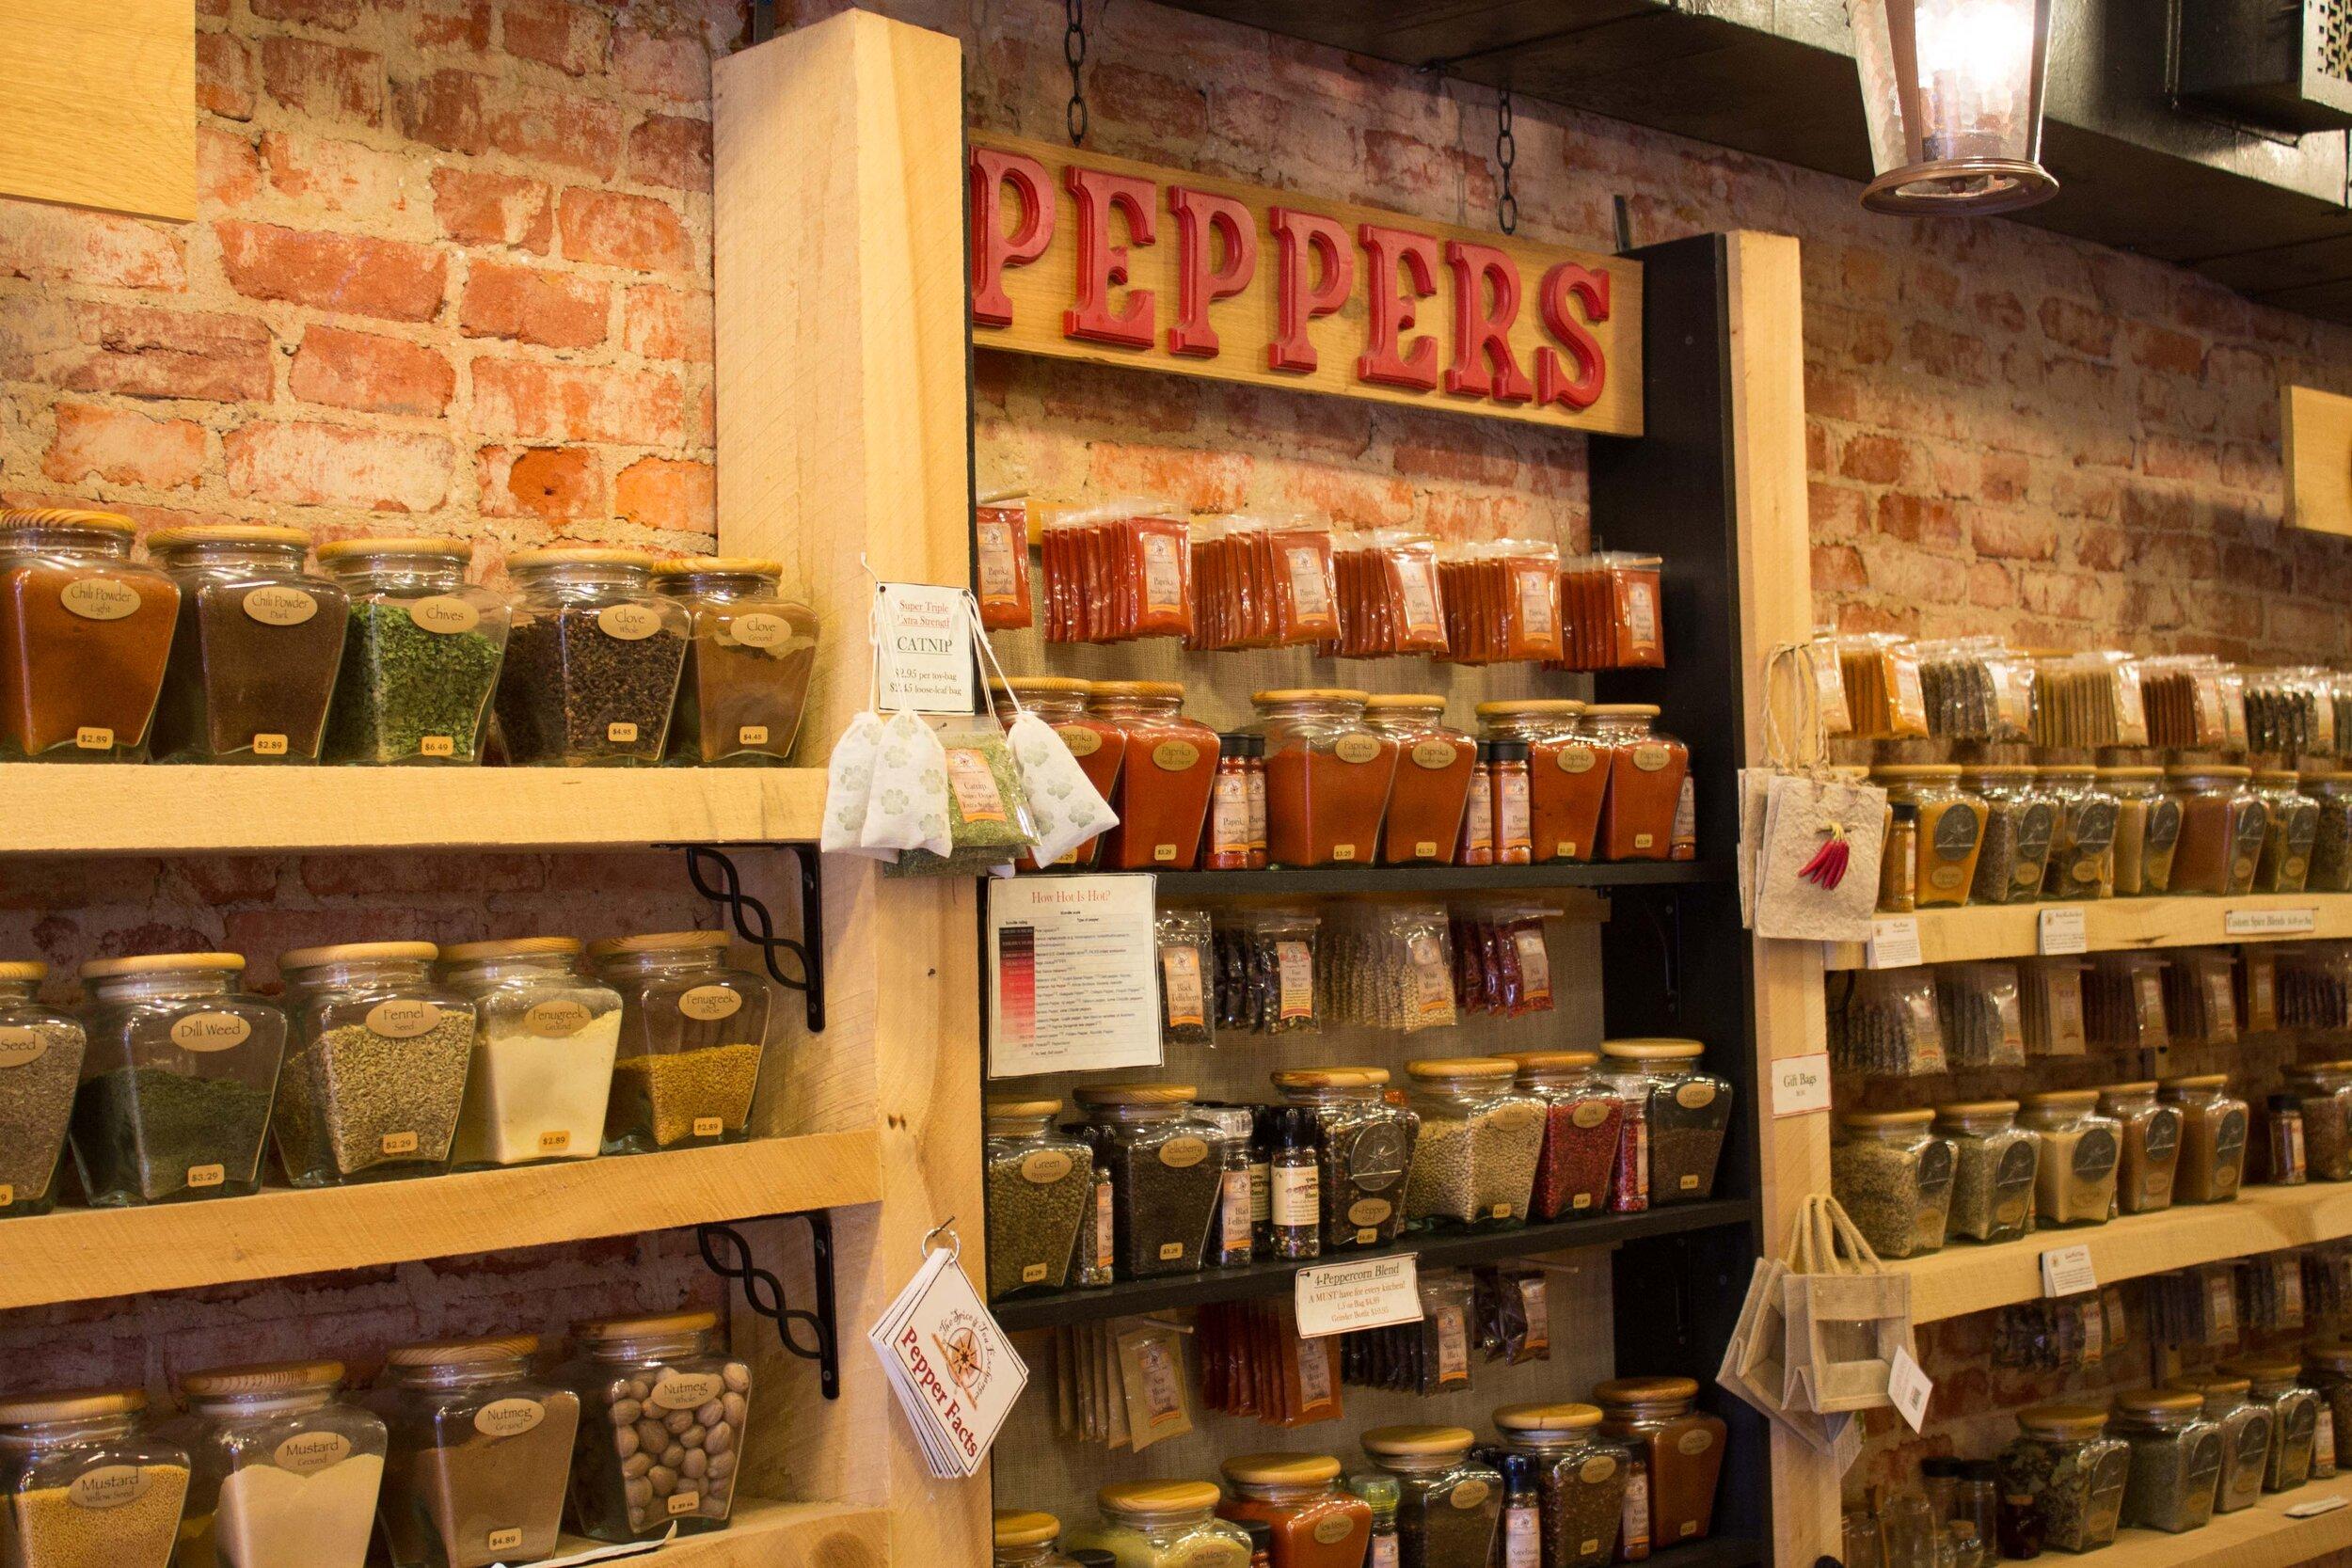 2013-10-06 Spice and Tea Exchange Georgetown-5112.jpg